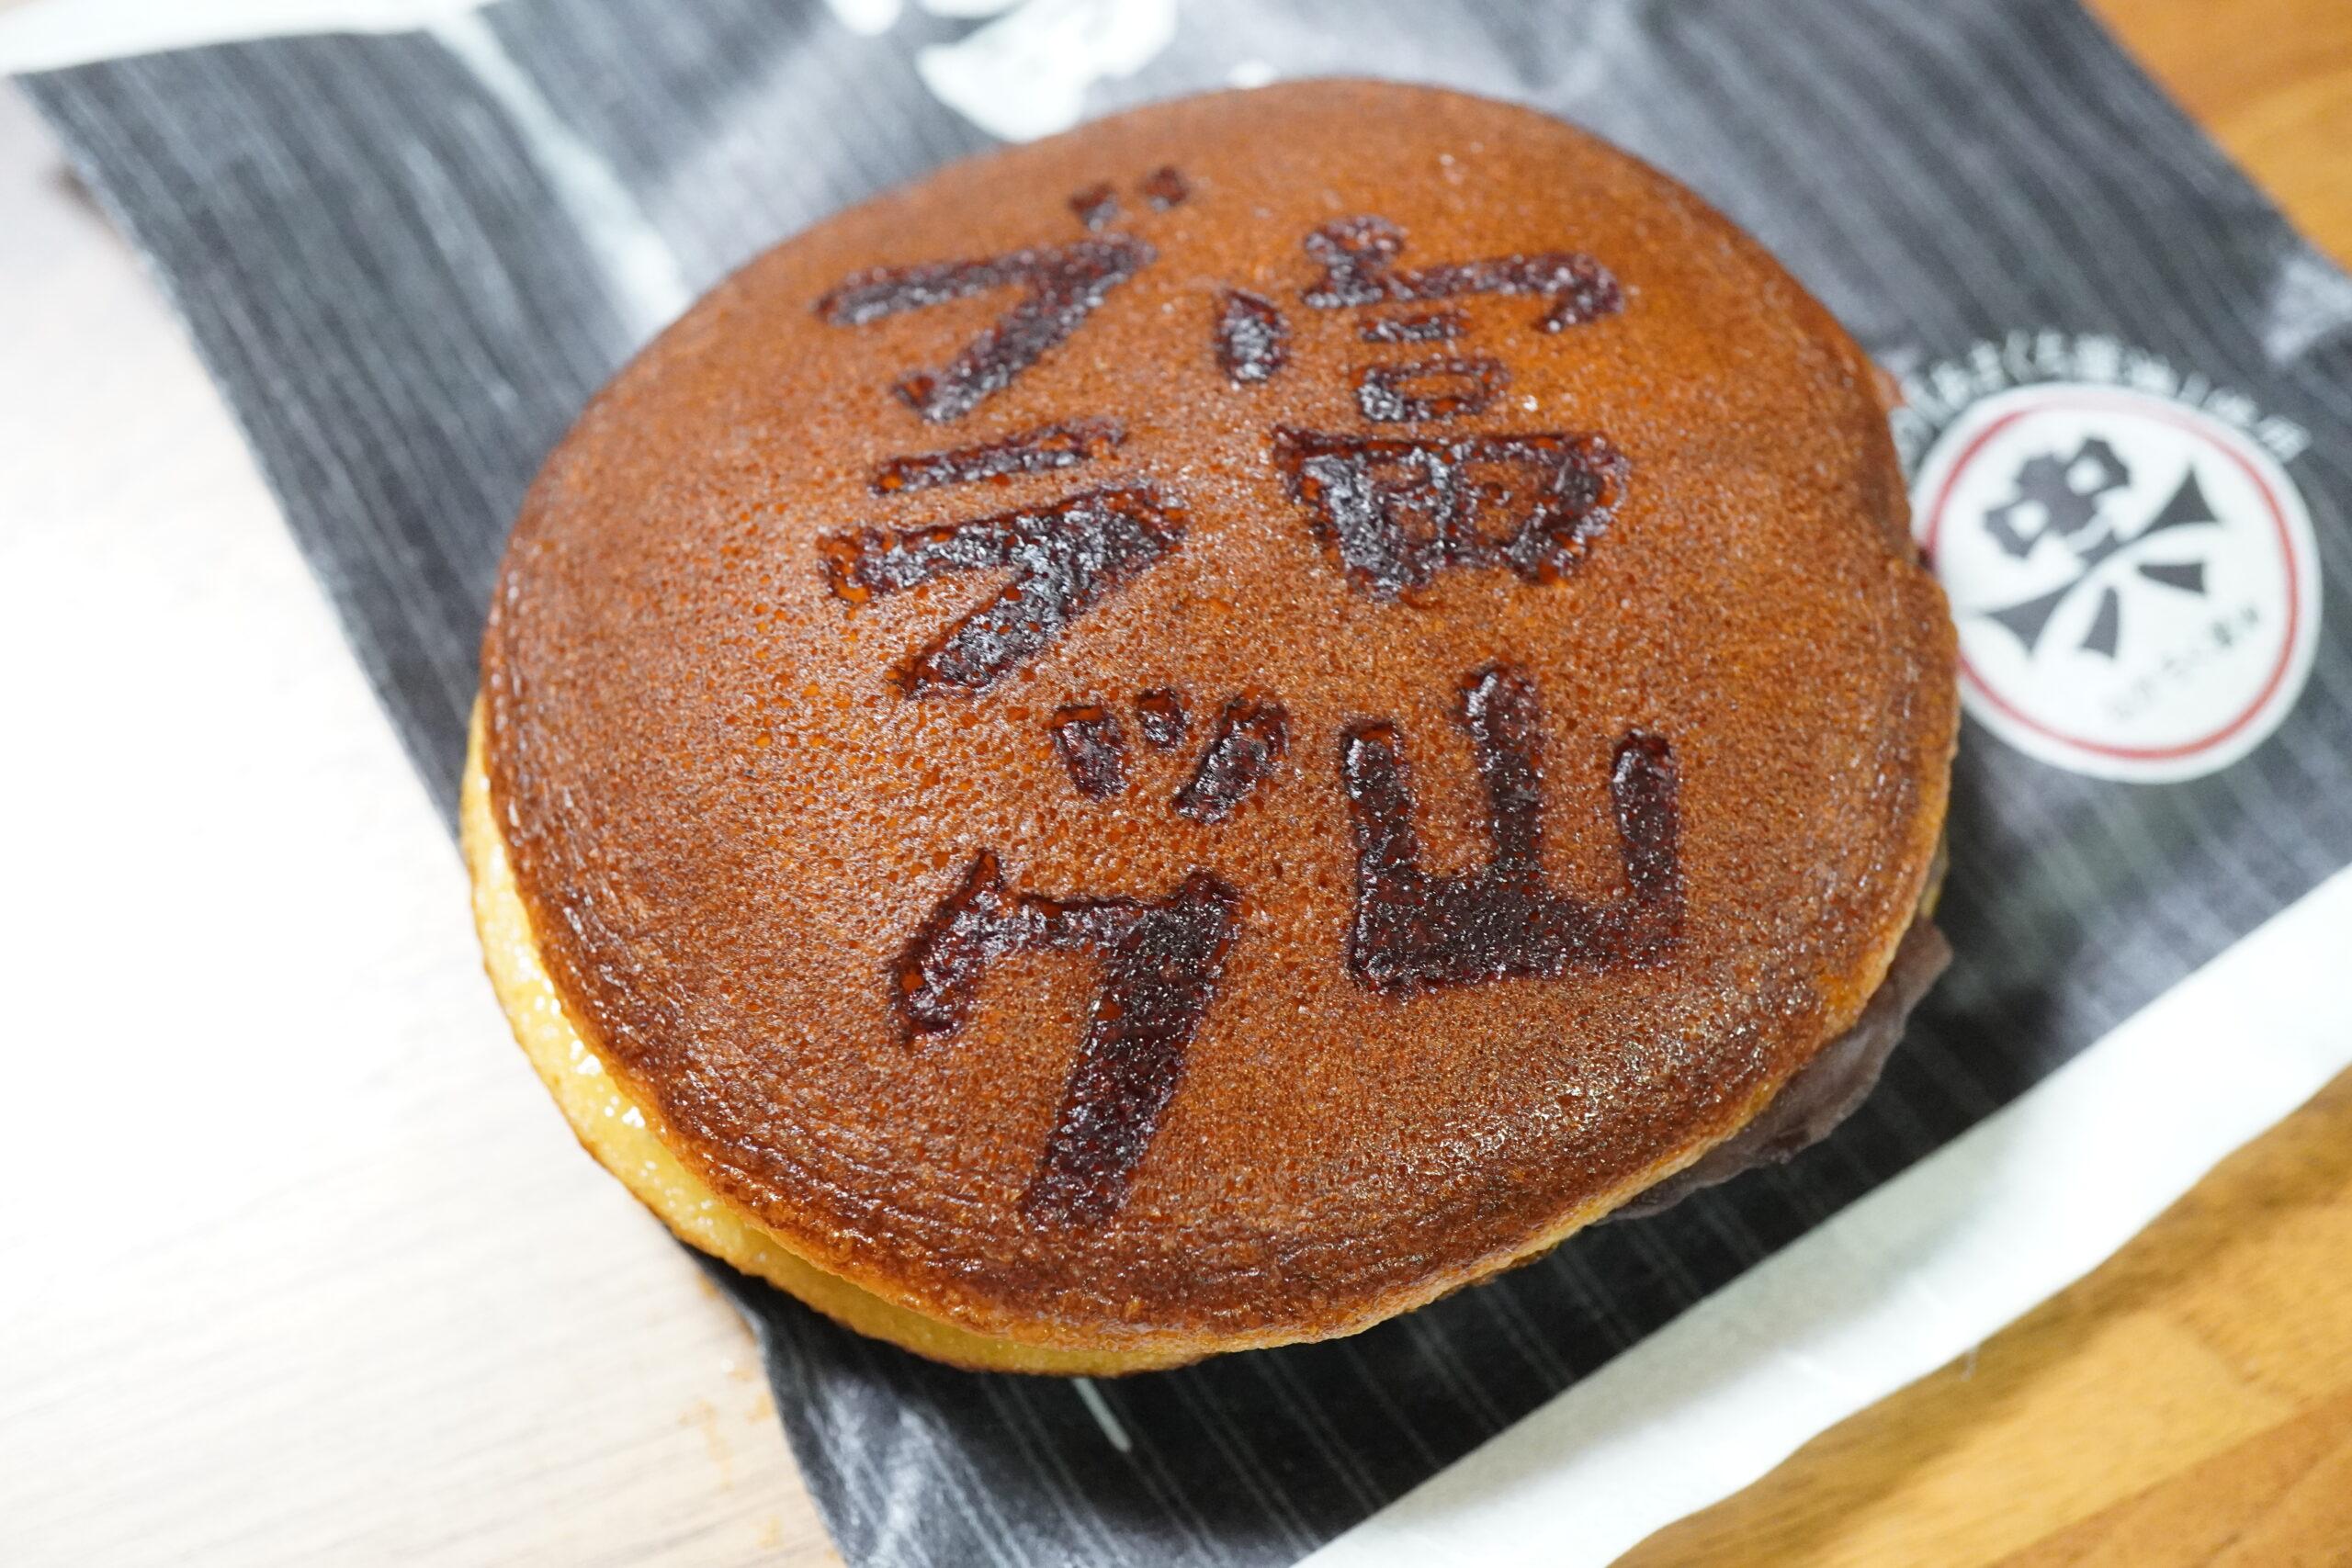 https://nomuraya.theshop.jp/items/14931563